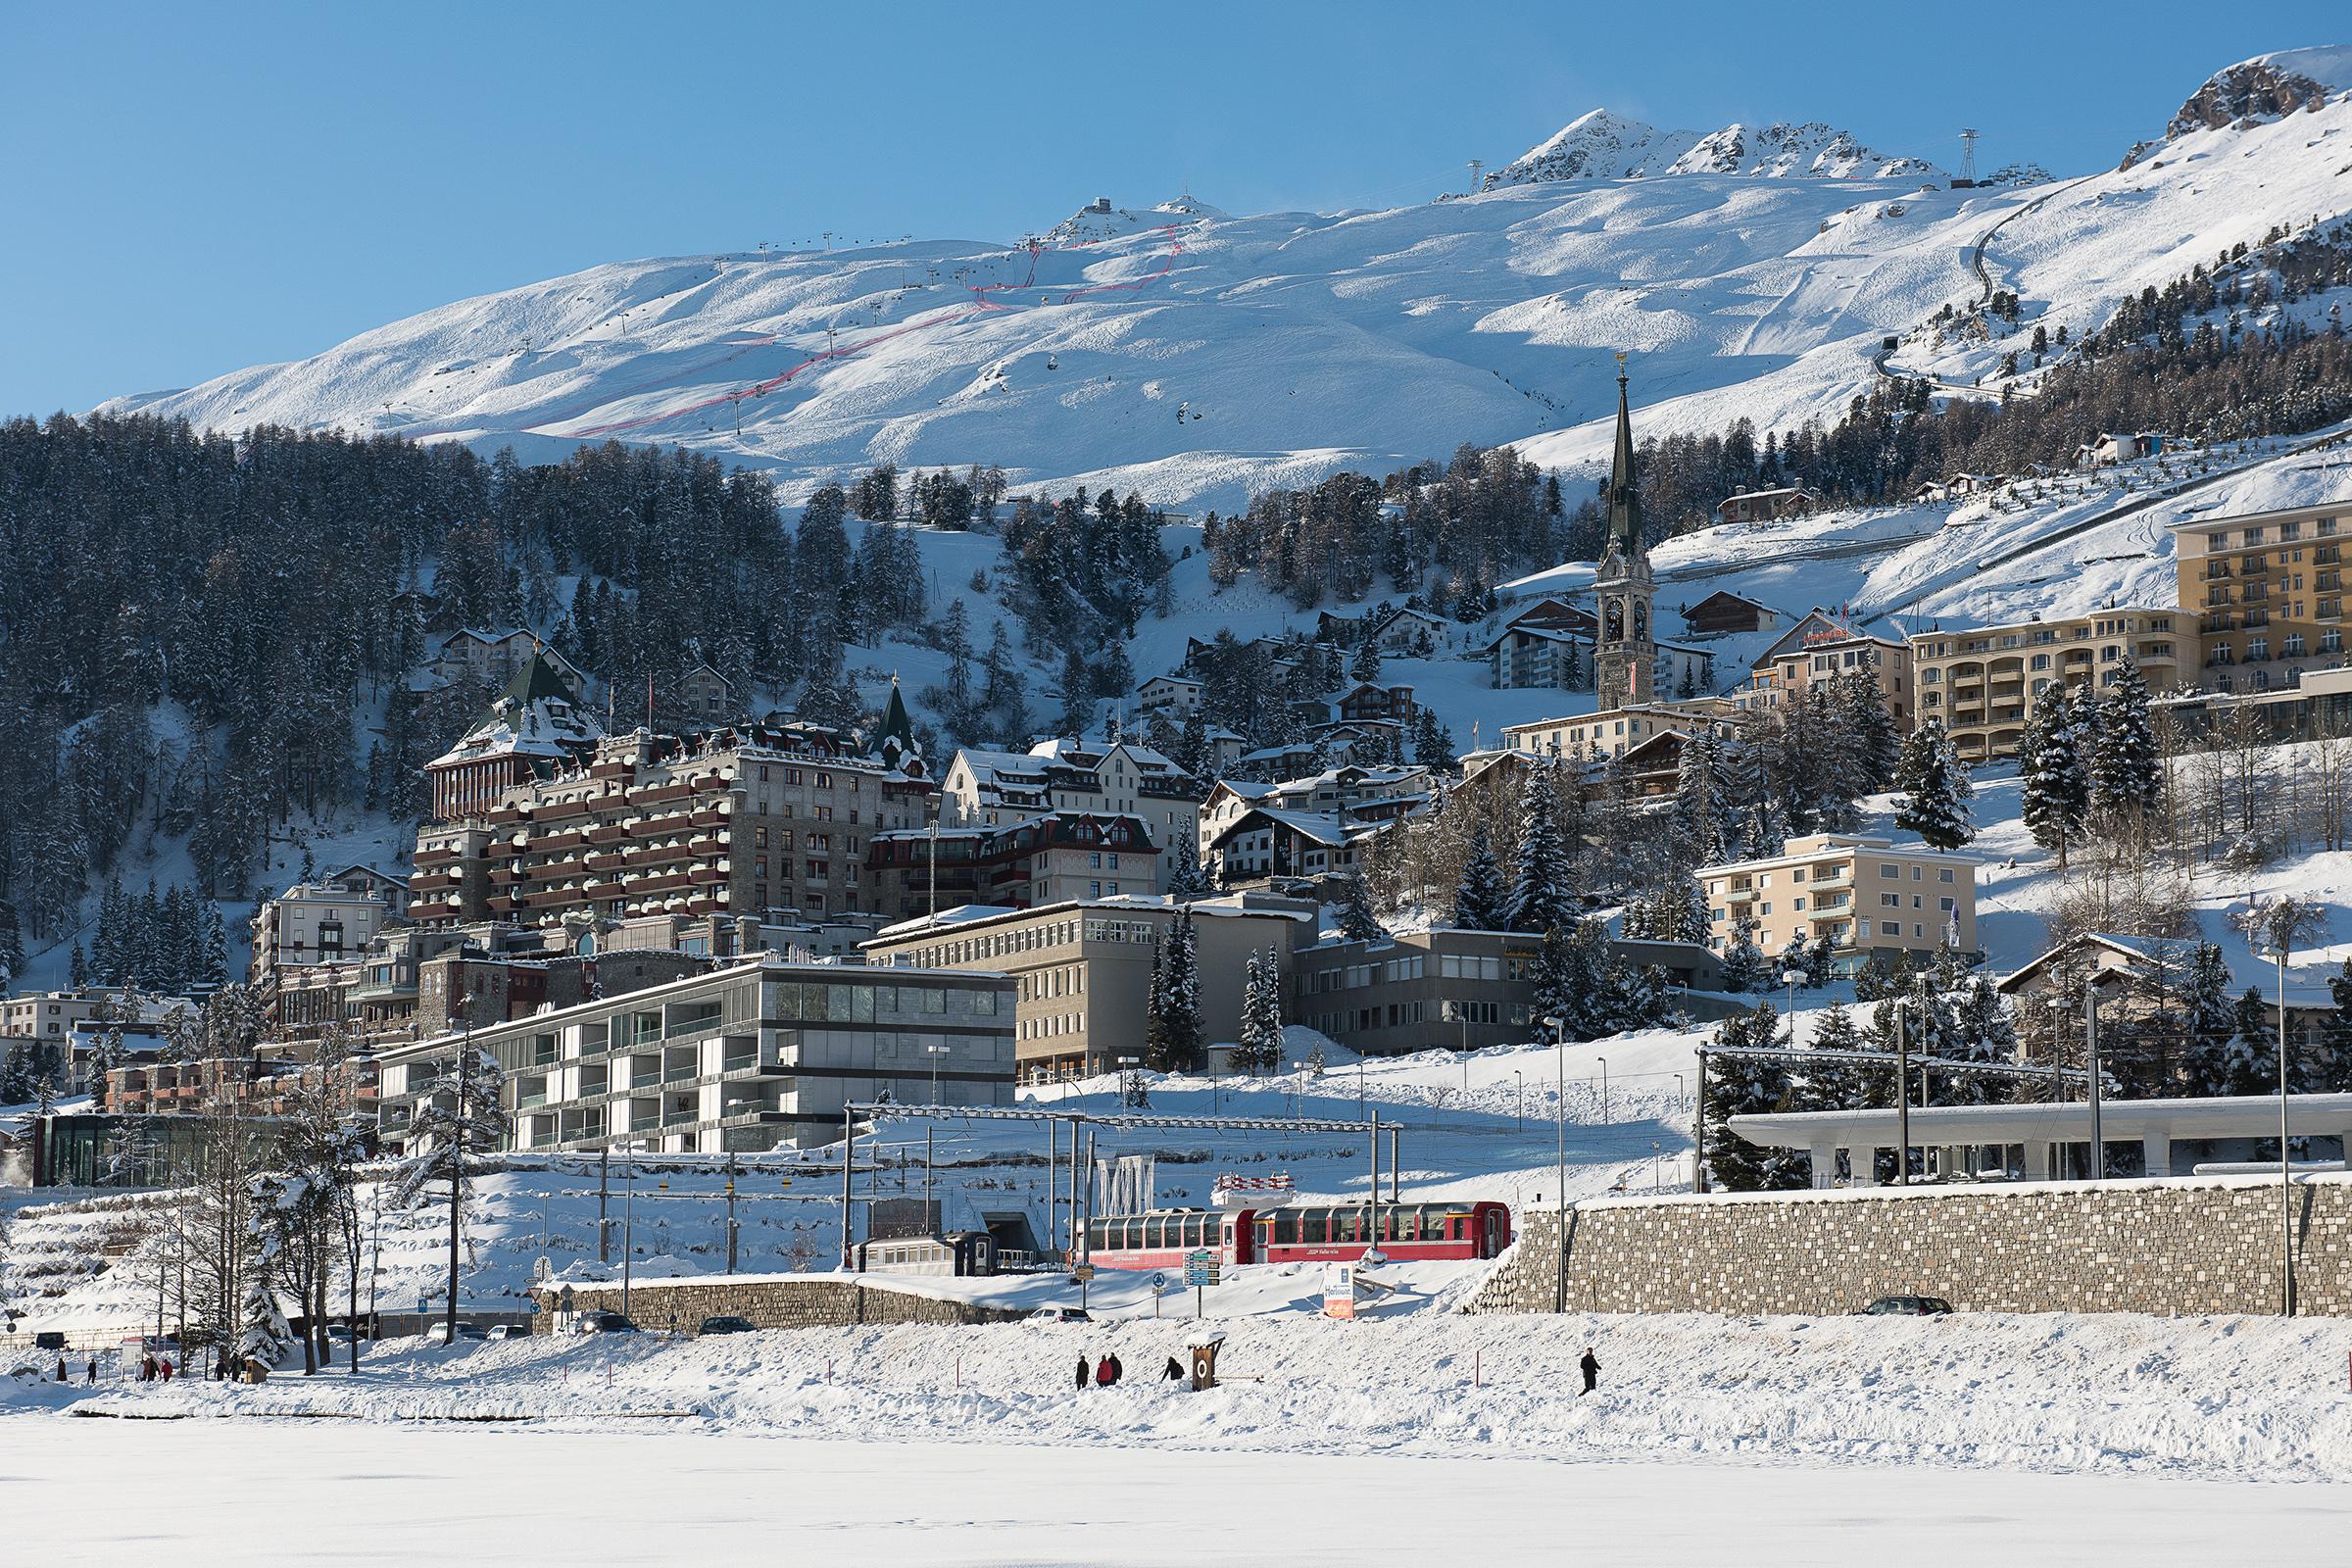 The story of St. Moritz